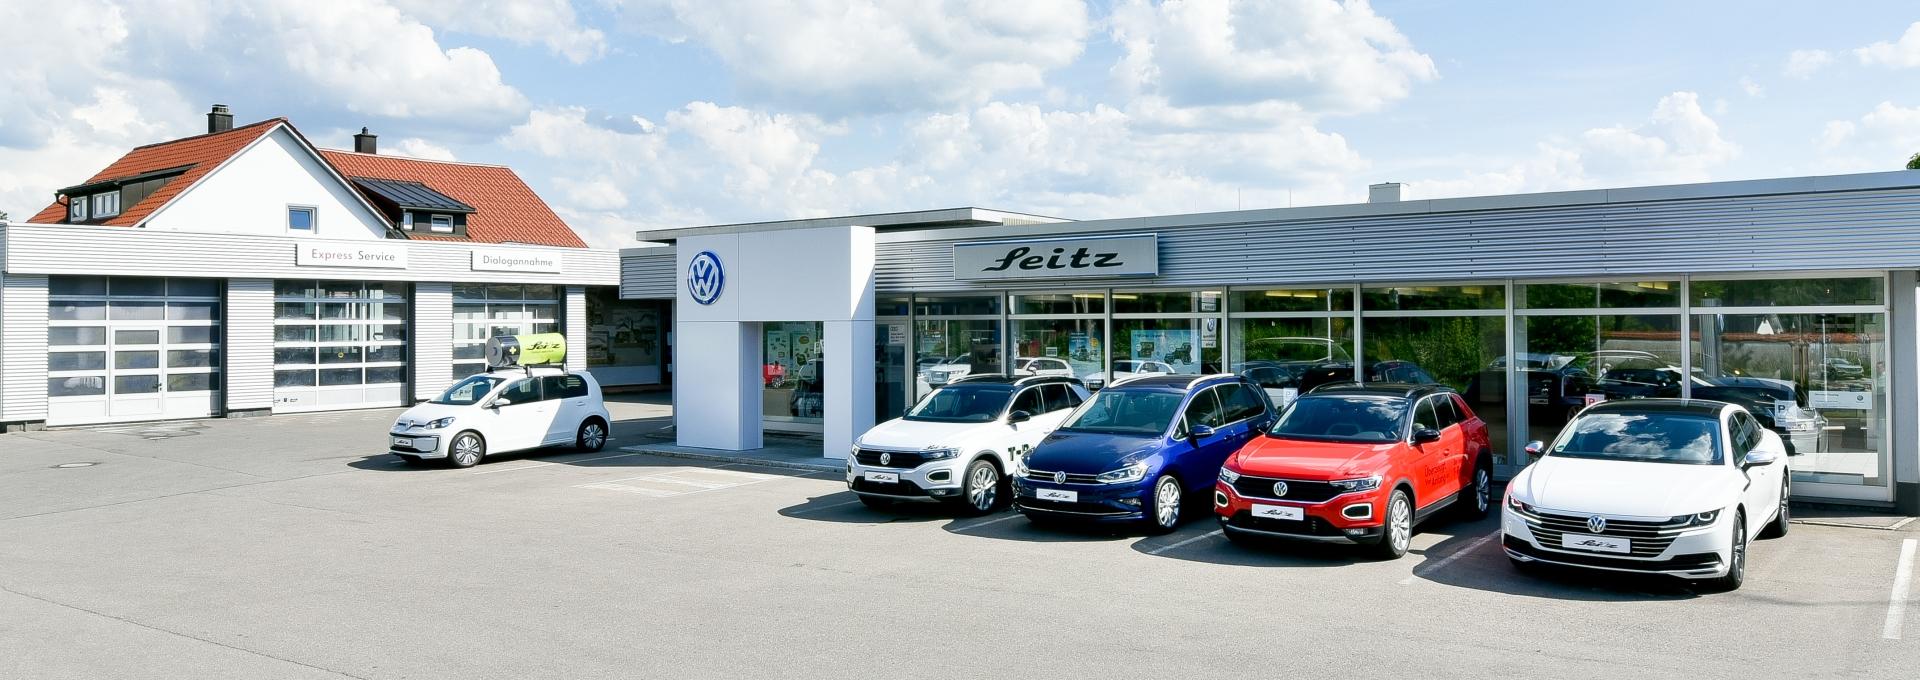 volkswagen autohaus seitz in isny | autohaus seitz